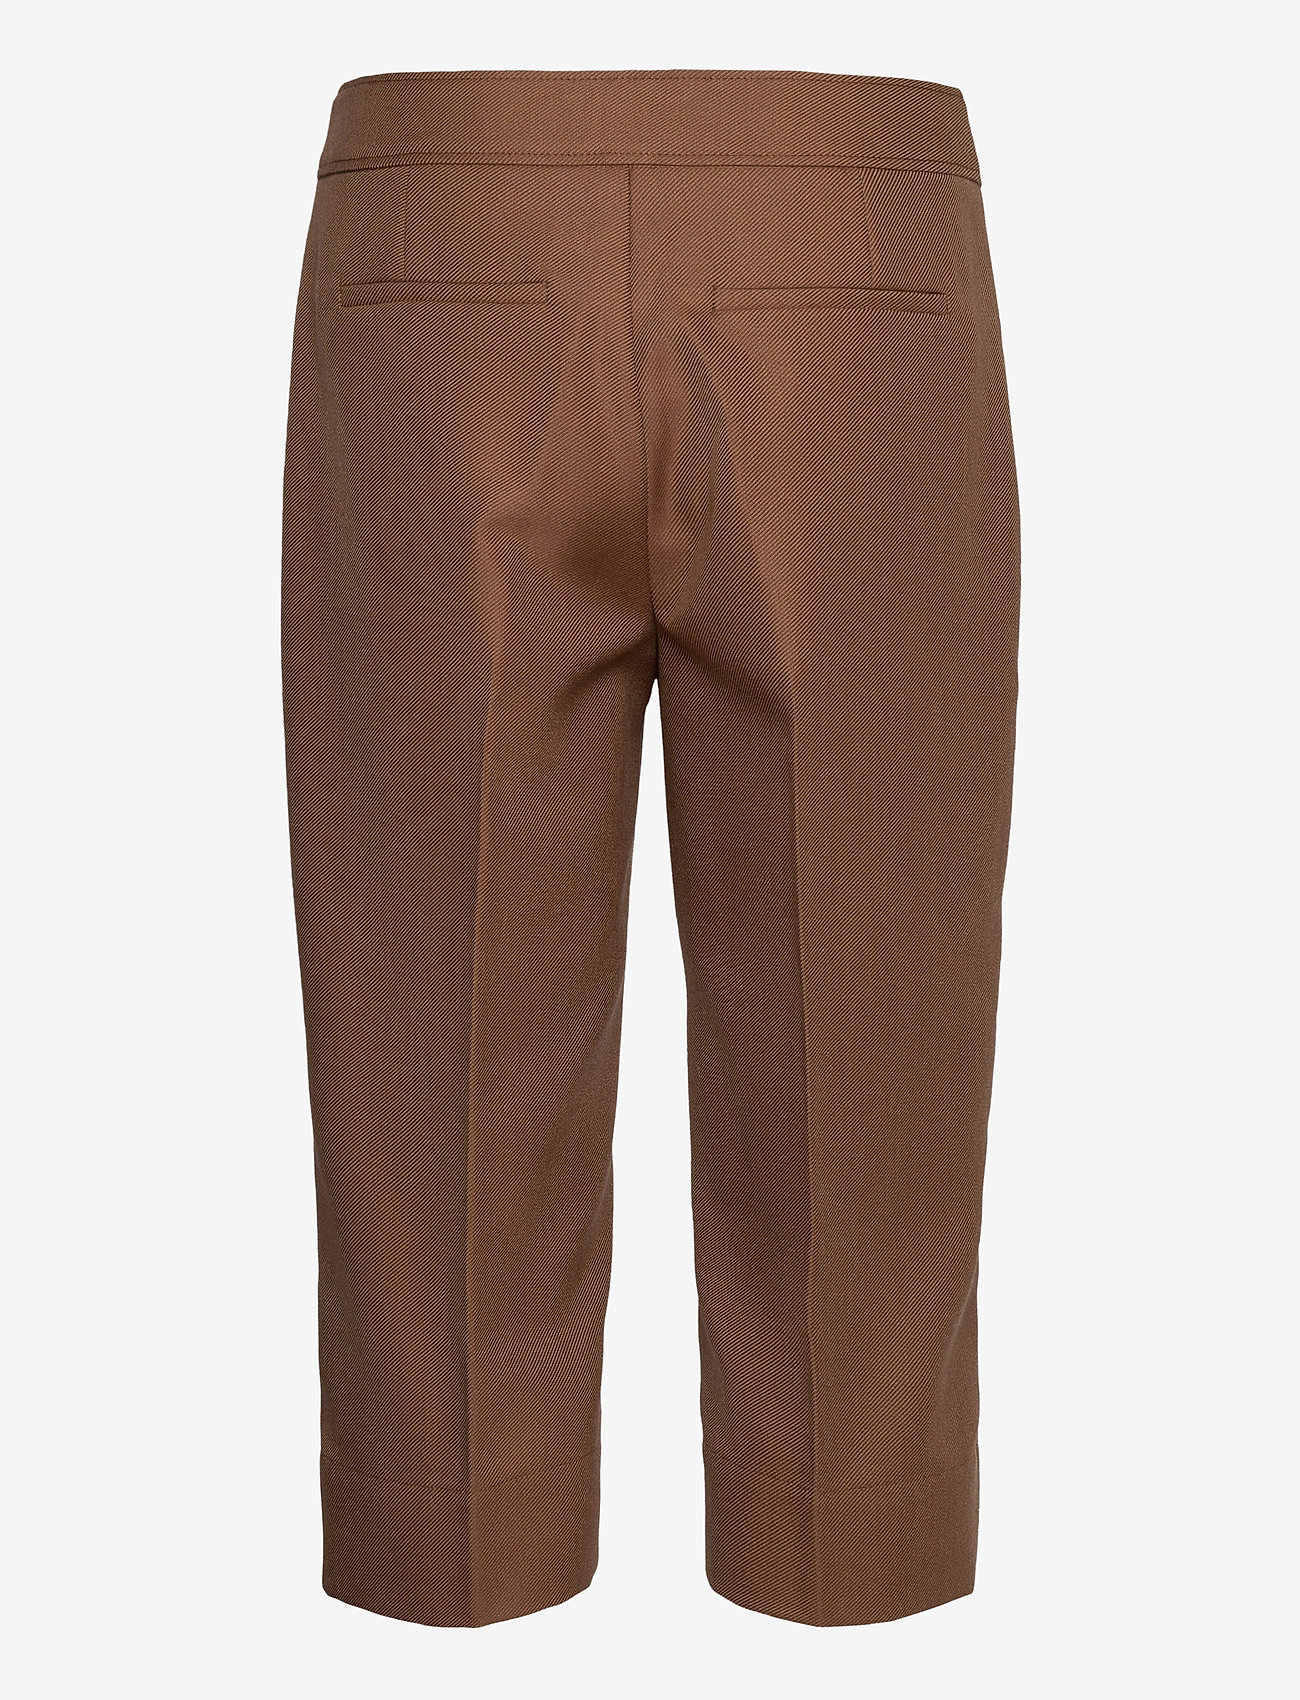 Birgitte Herskind - Banks  Shorts - bermudas - androa brown - 1